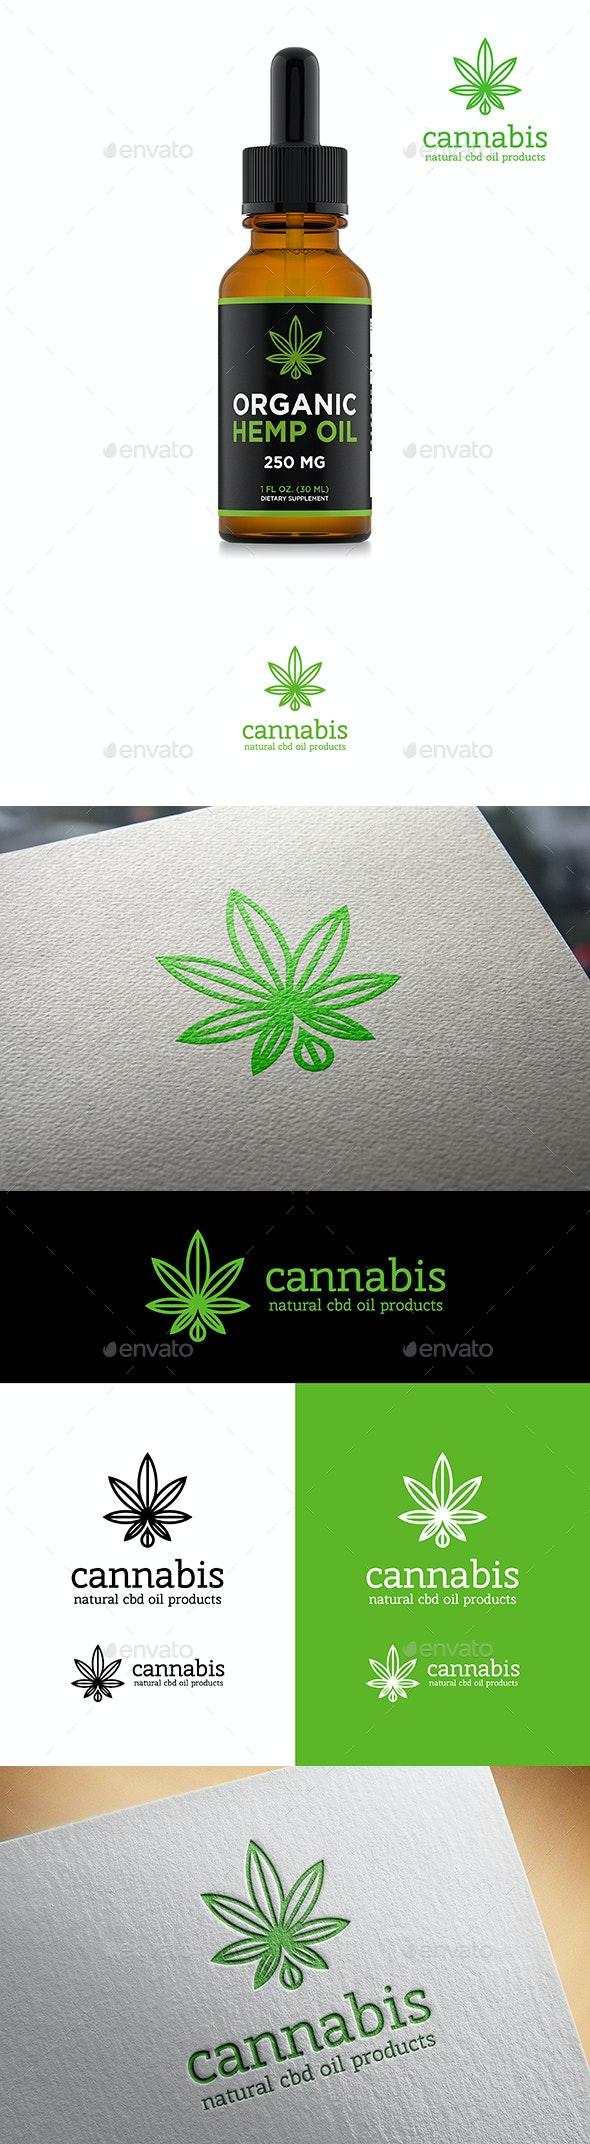 Cannabis Leaf Natural CBD Oil Logo for Marijuana Products - Nature Logo Templates